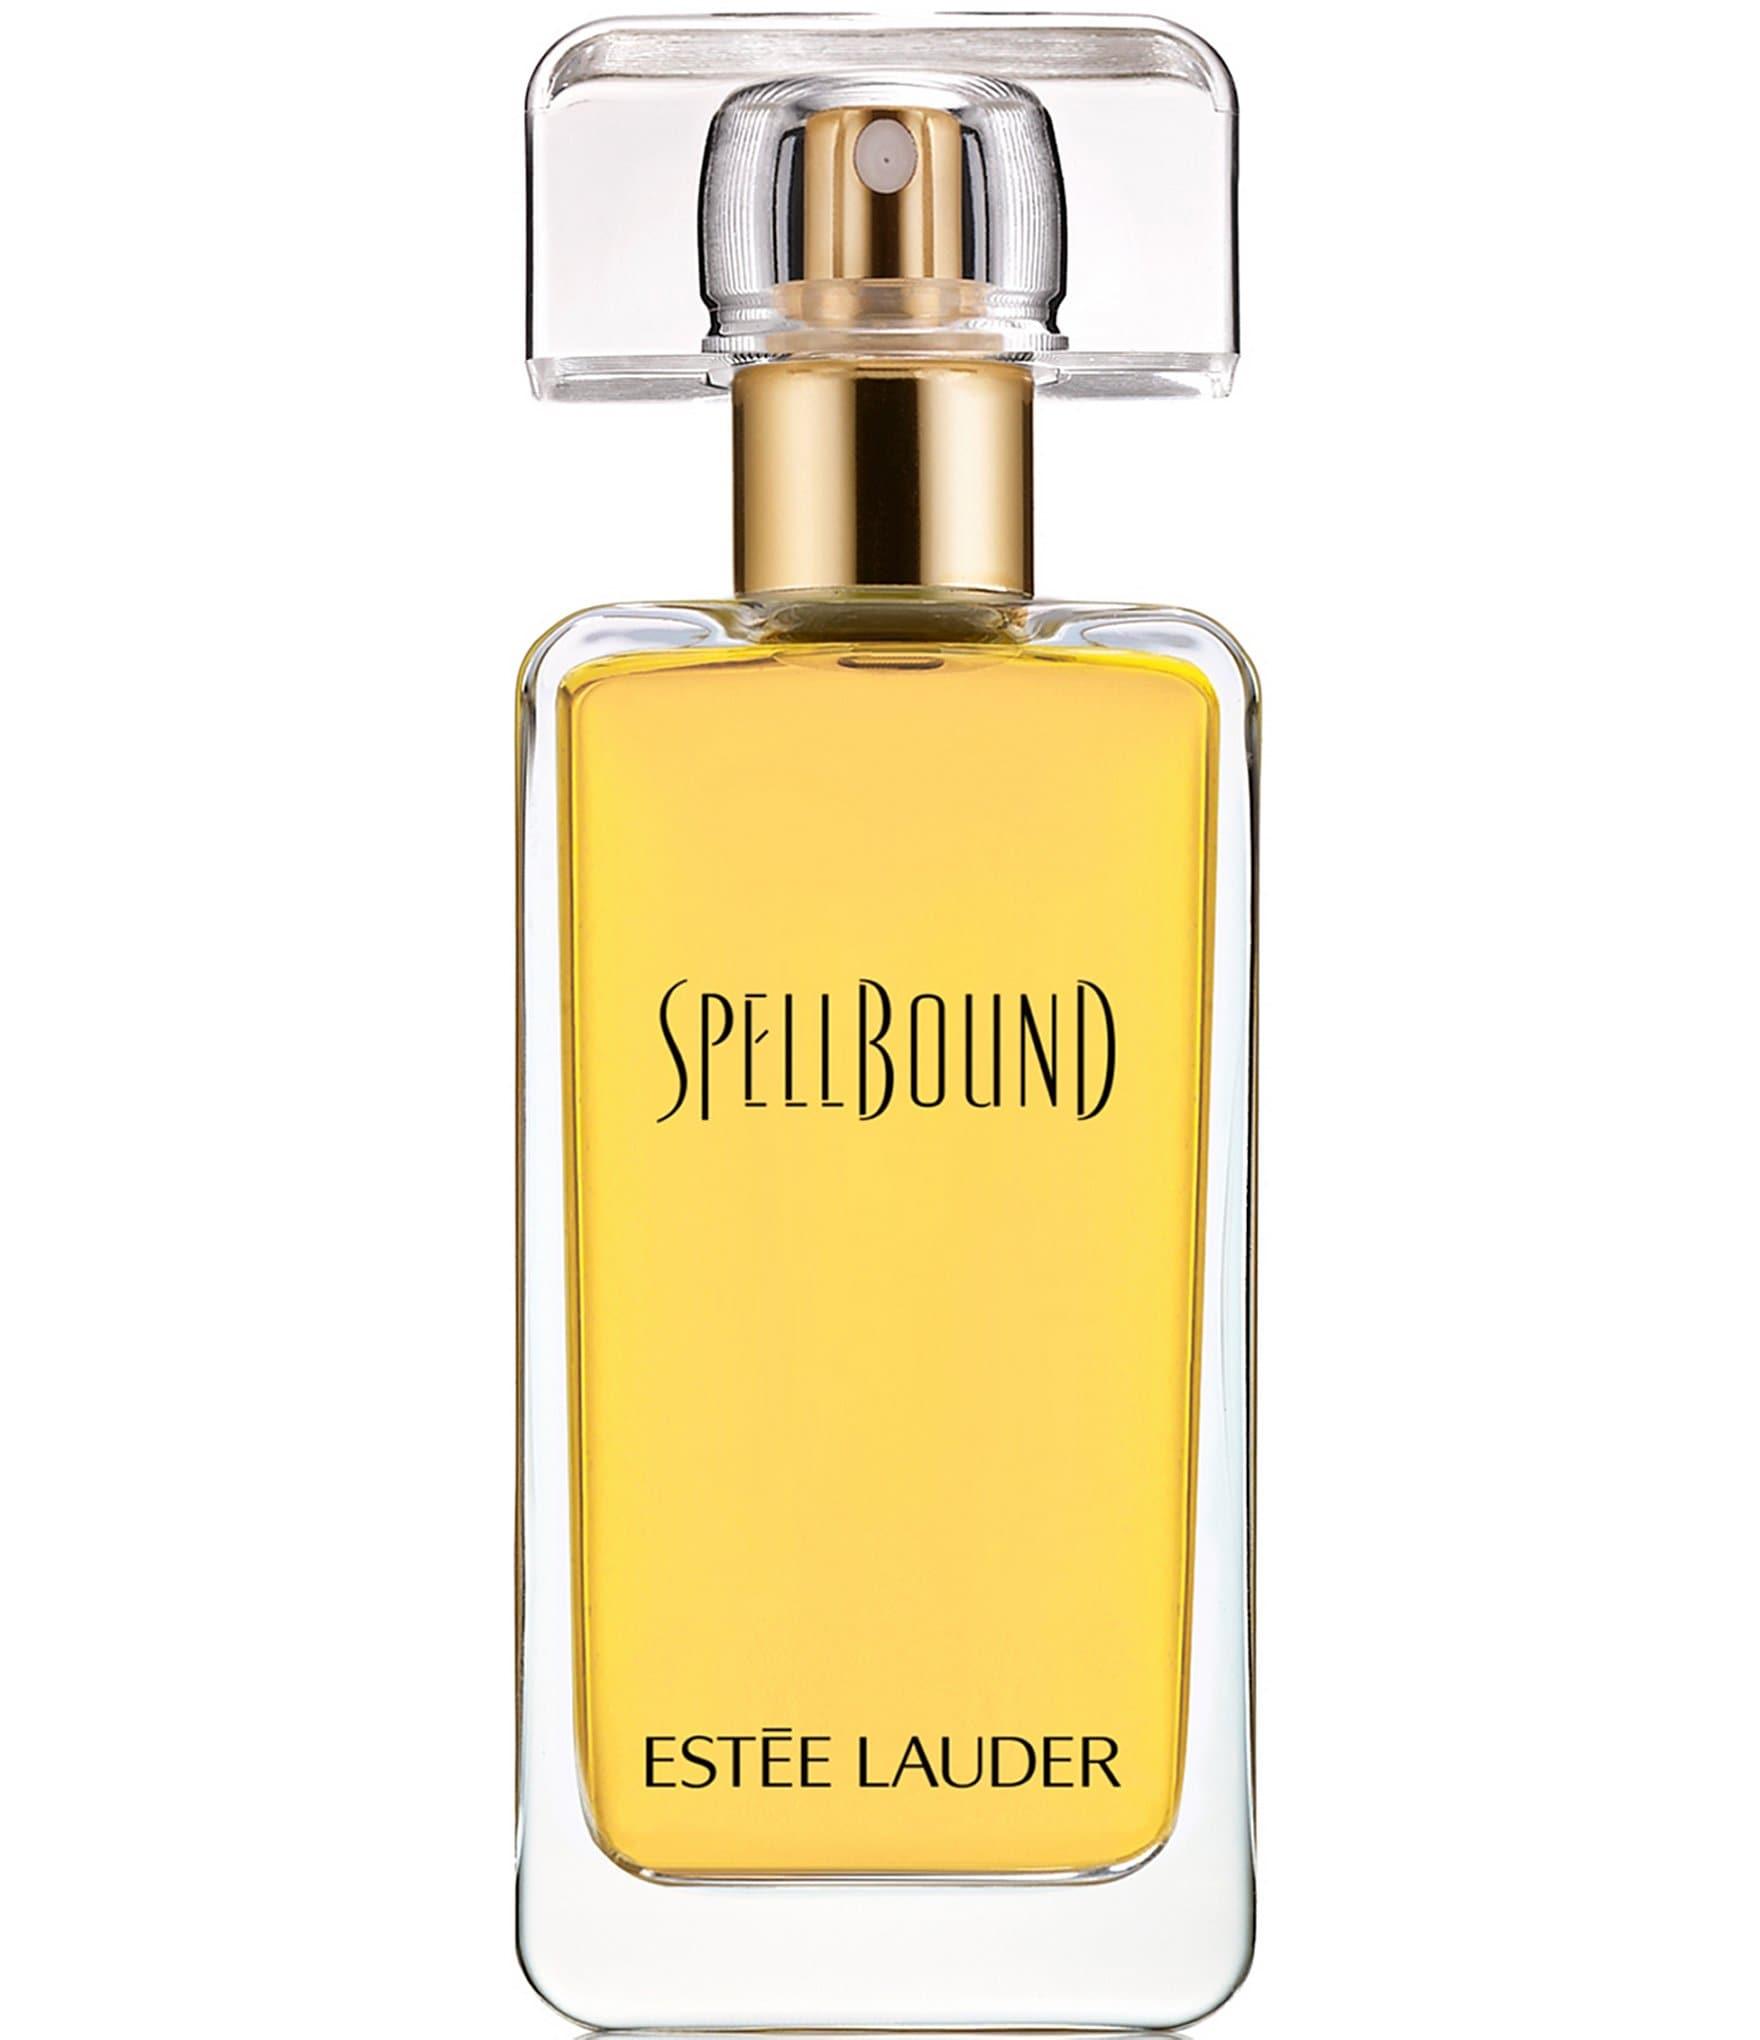 estee lauder spellbound eau de parfum spray dillards. Black Bedroom Furniture Sets. Home Design Ideas